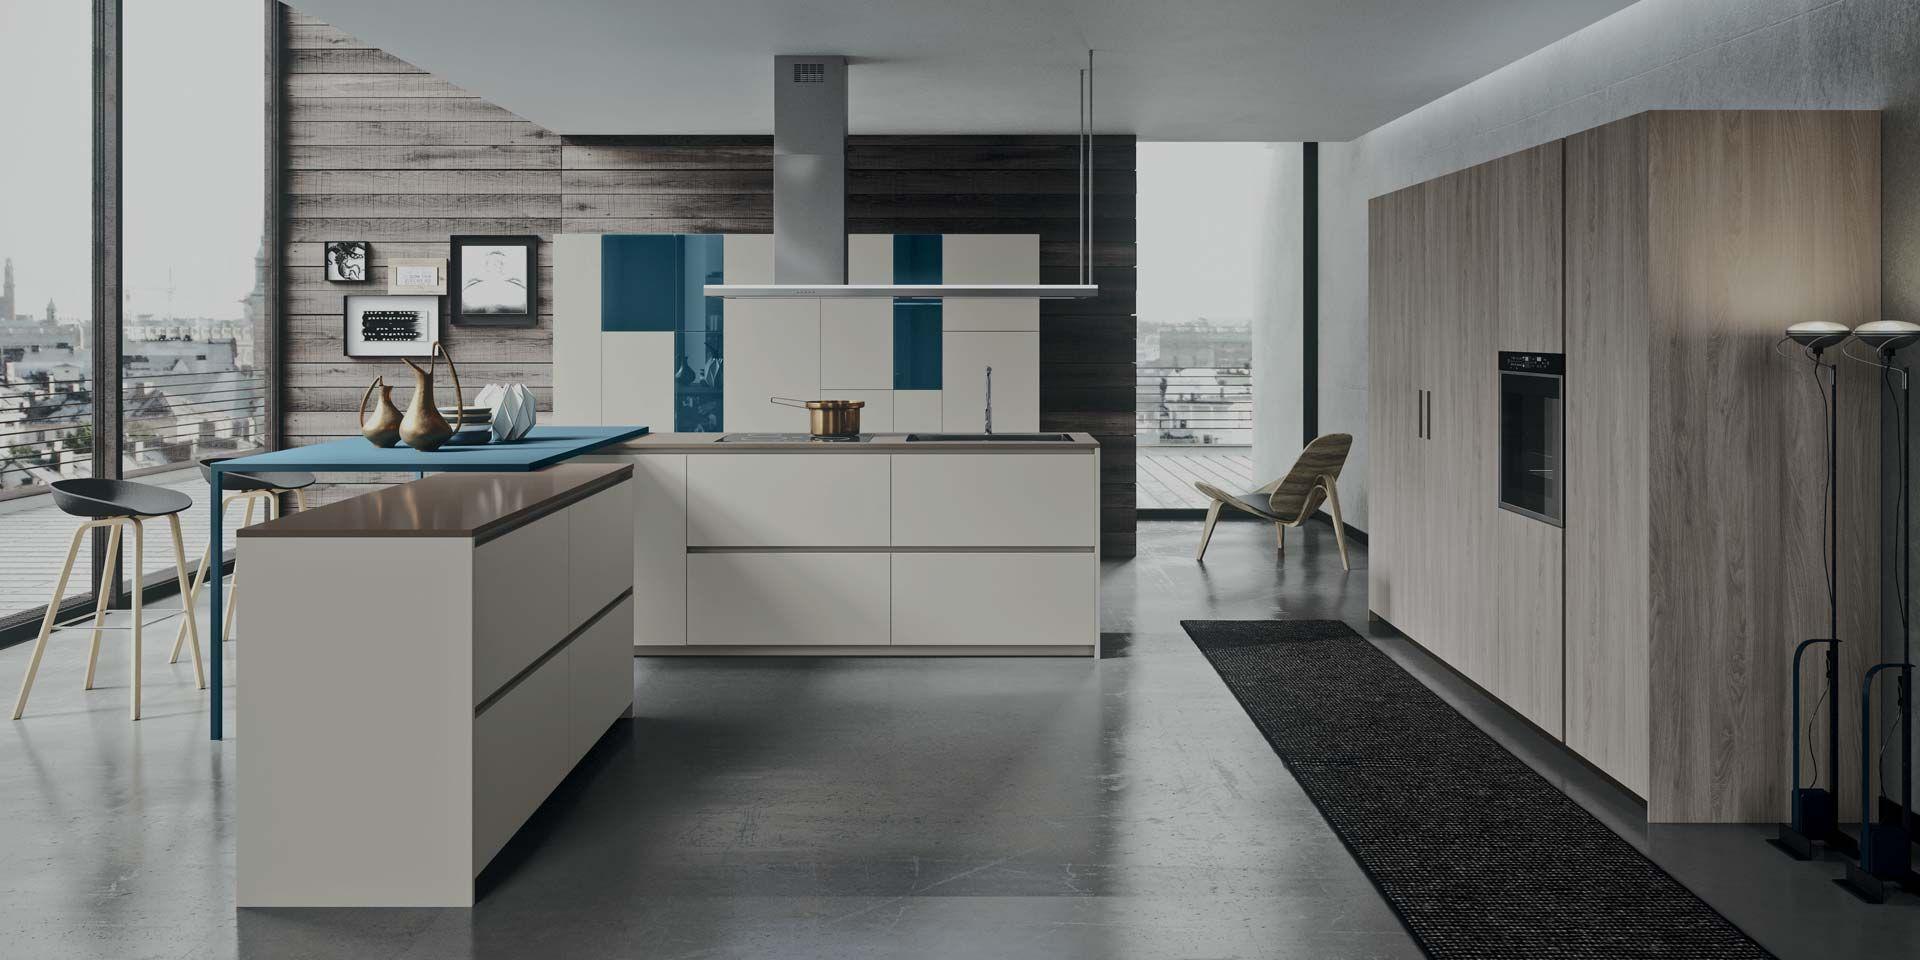 Custom Built Modern Italian Kitchens Visit Our Showroom For More Details Kitchen Cabinet Design Modern Kitchen Cabinets Modern Kitchen